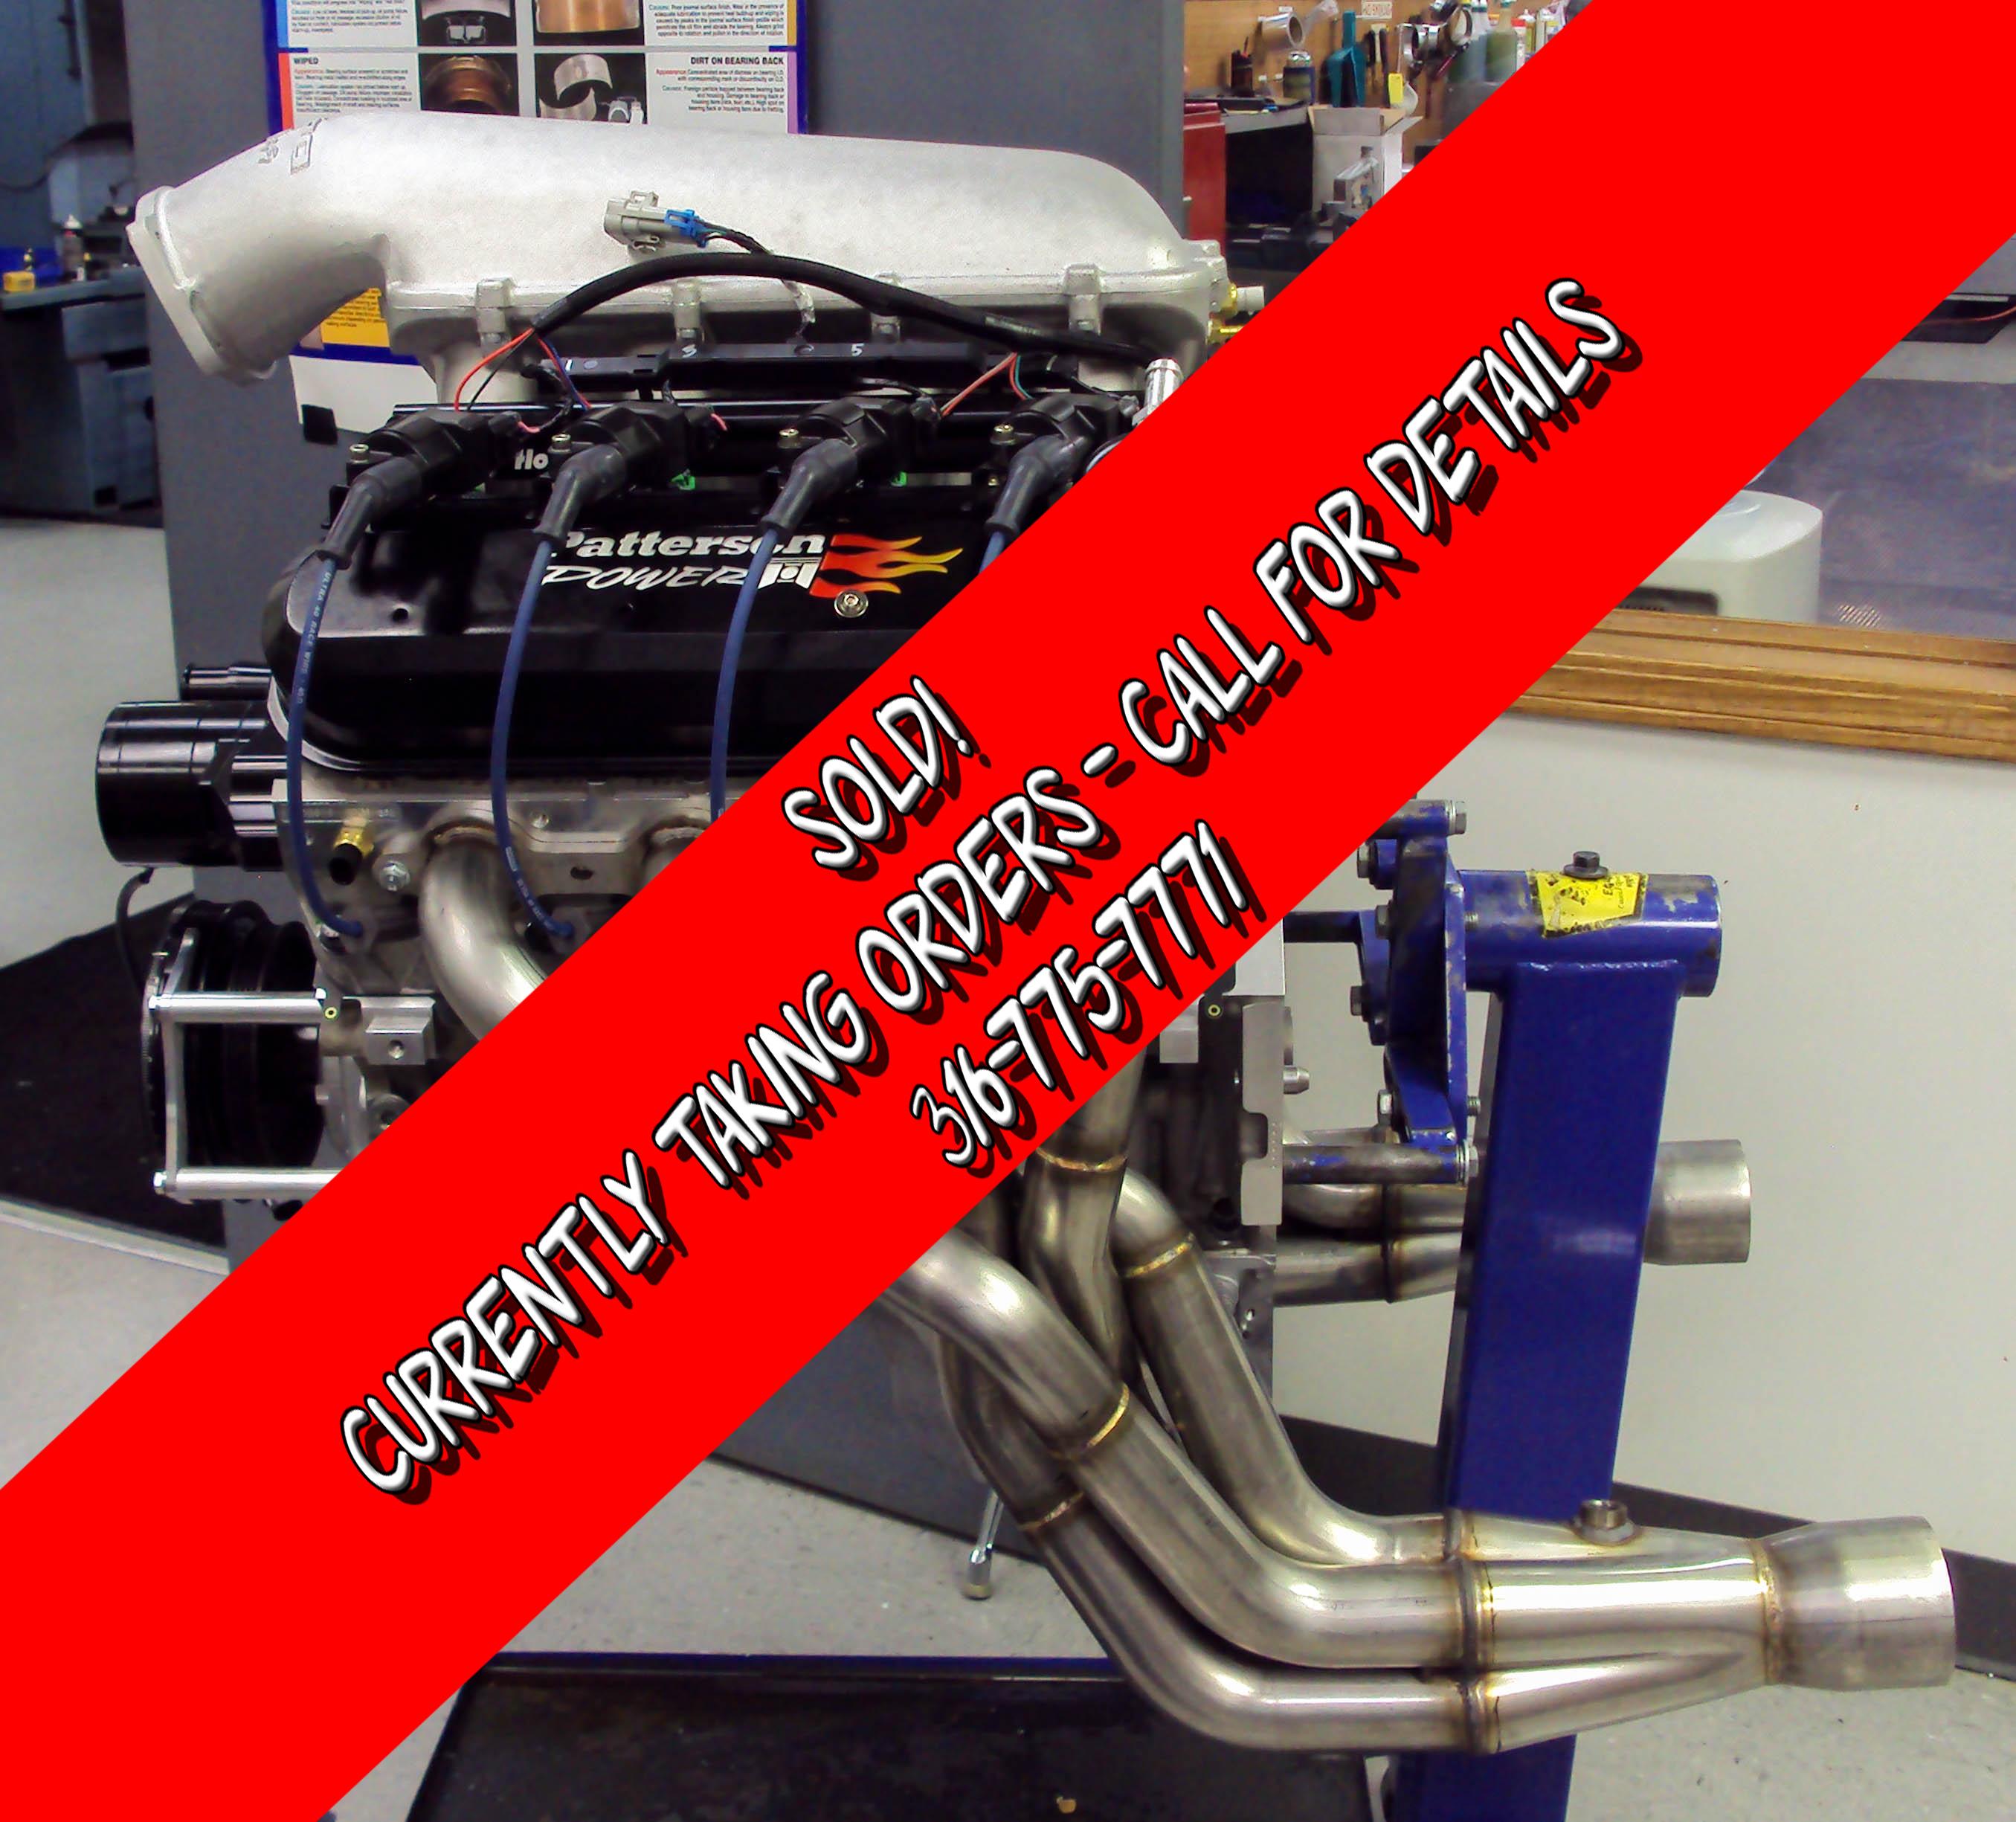 427-c.i.-copo-efi-engine-sold.jpg